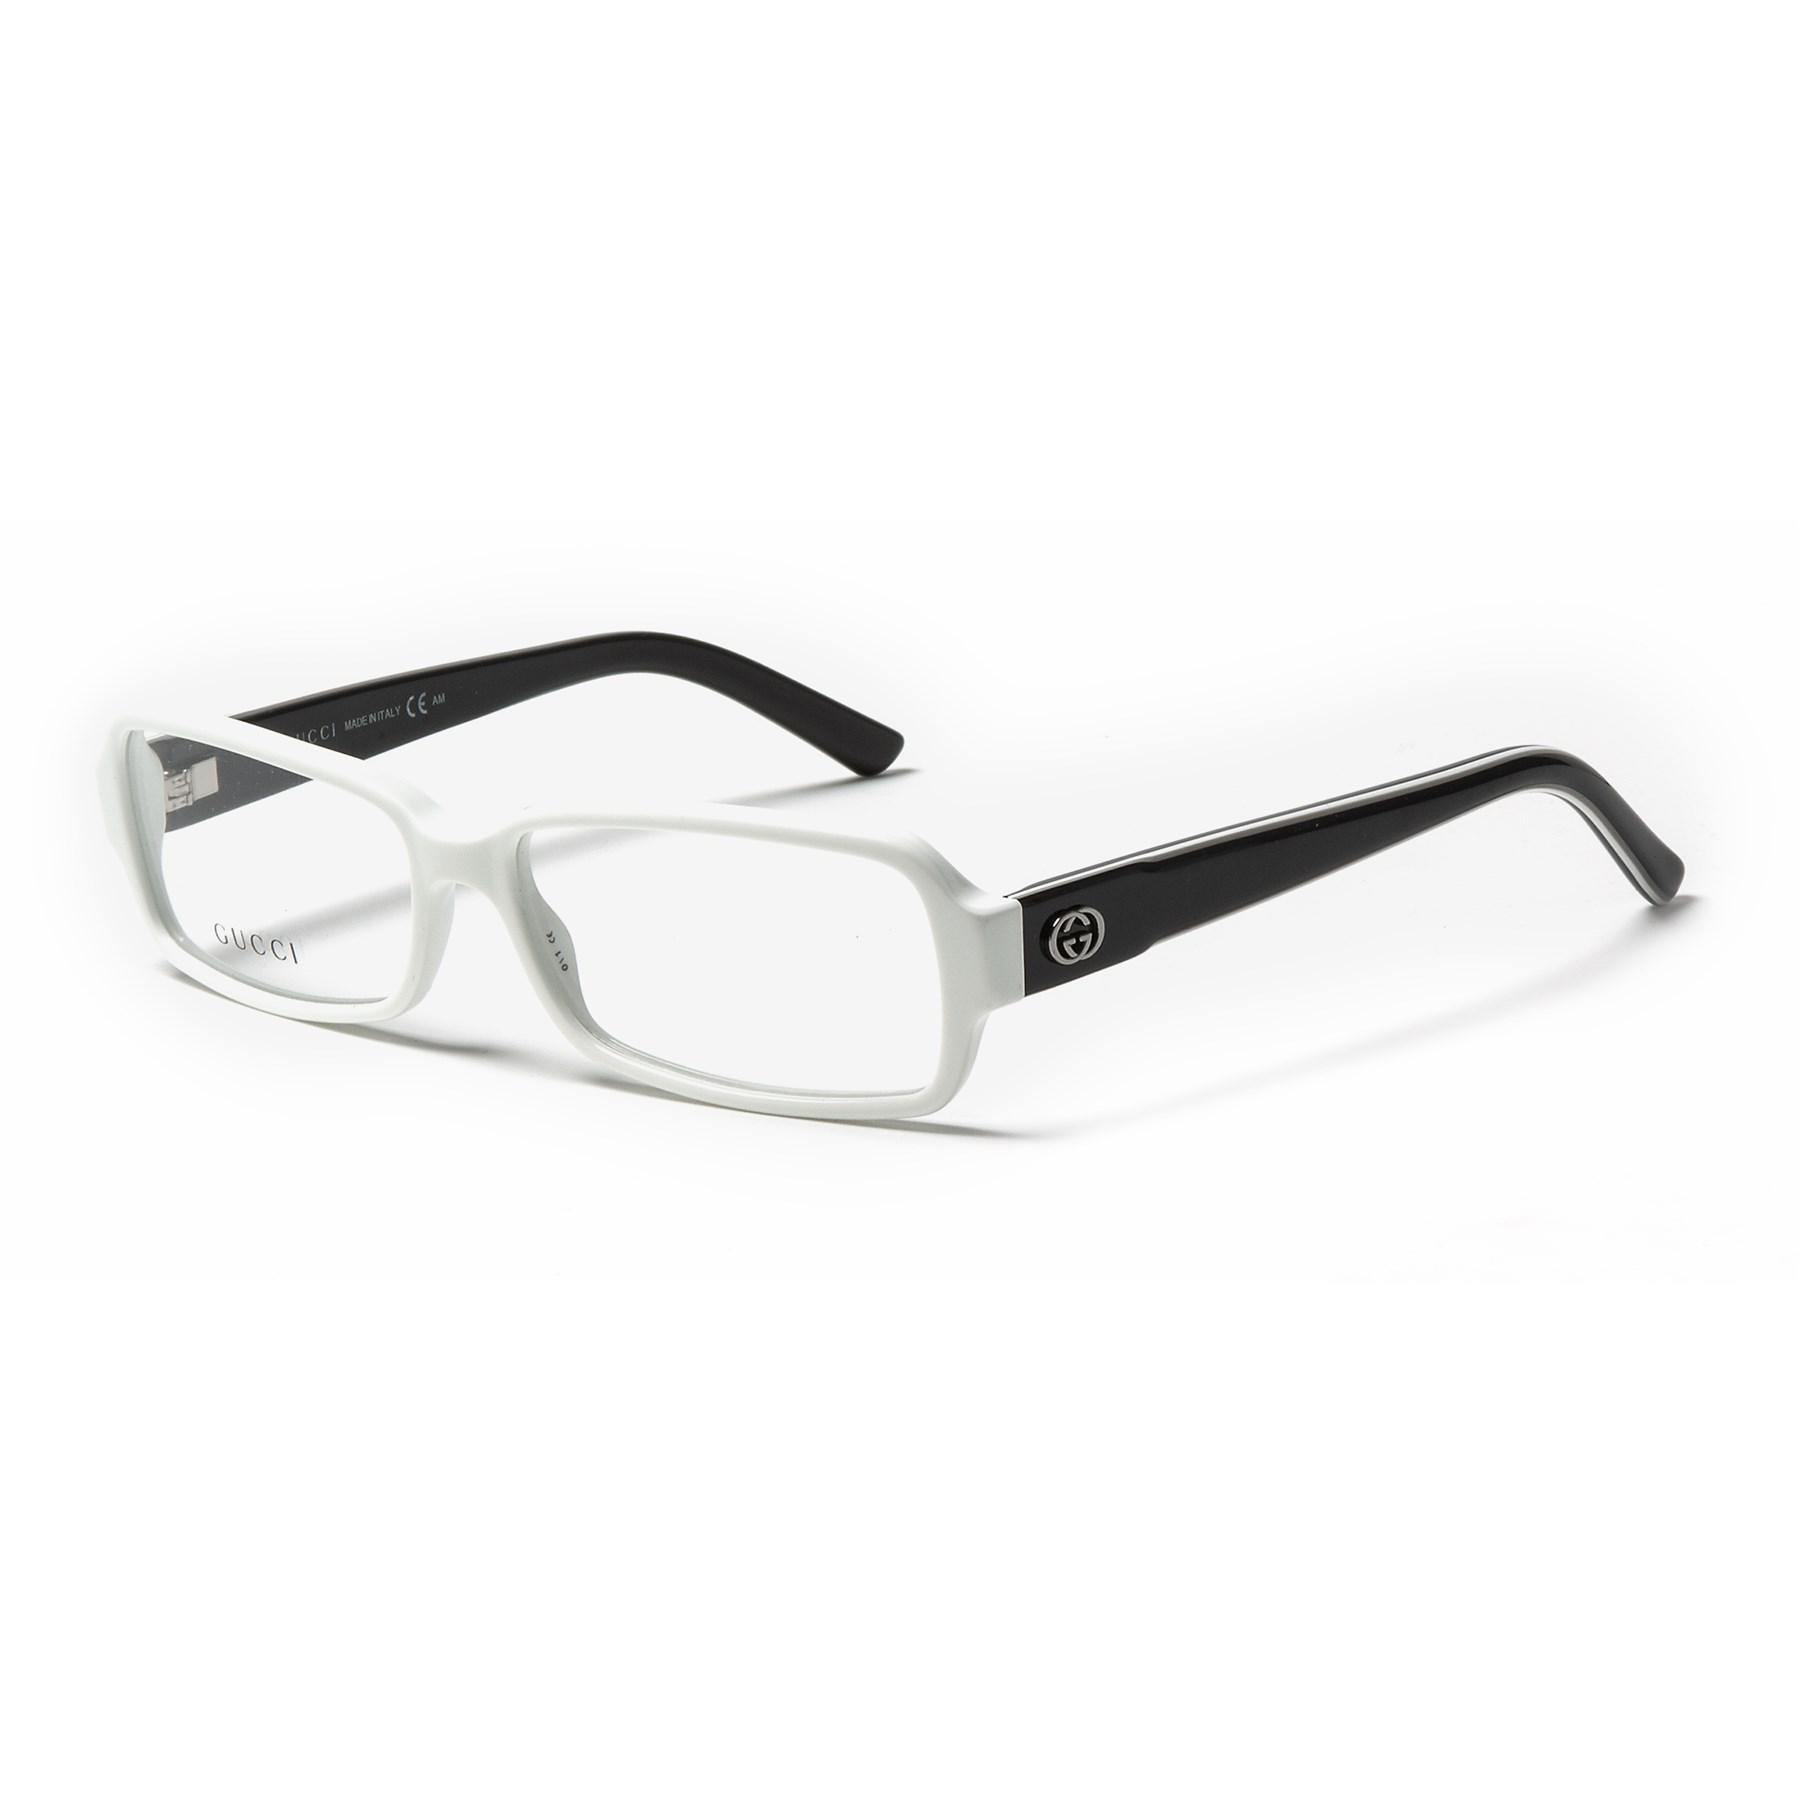 8a3525ec373 Lyst - Gucci GG 3124 Iq1 Designer Optical Reading Glasses (for Women ...